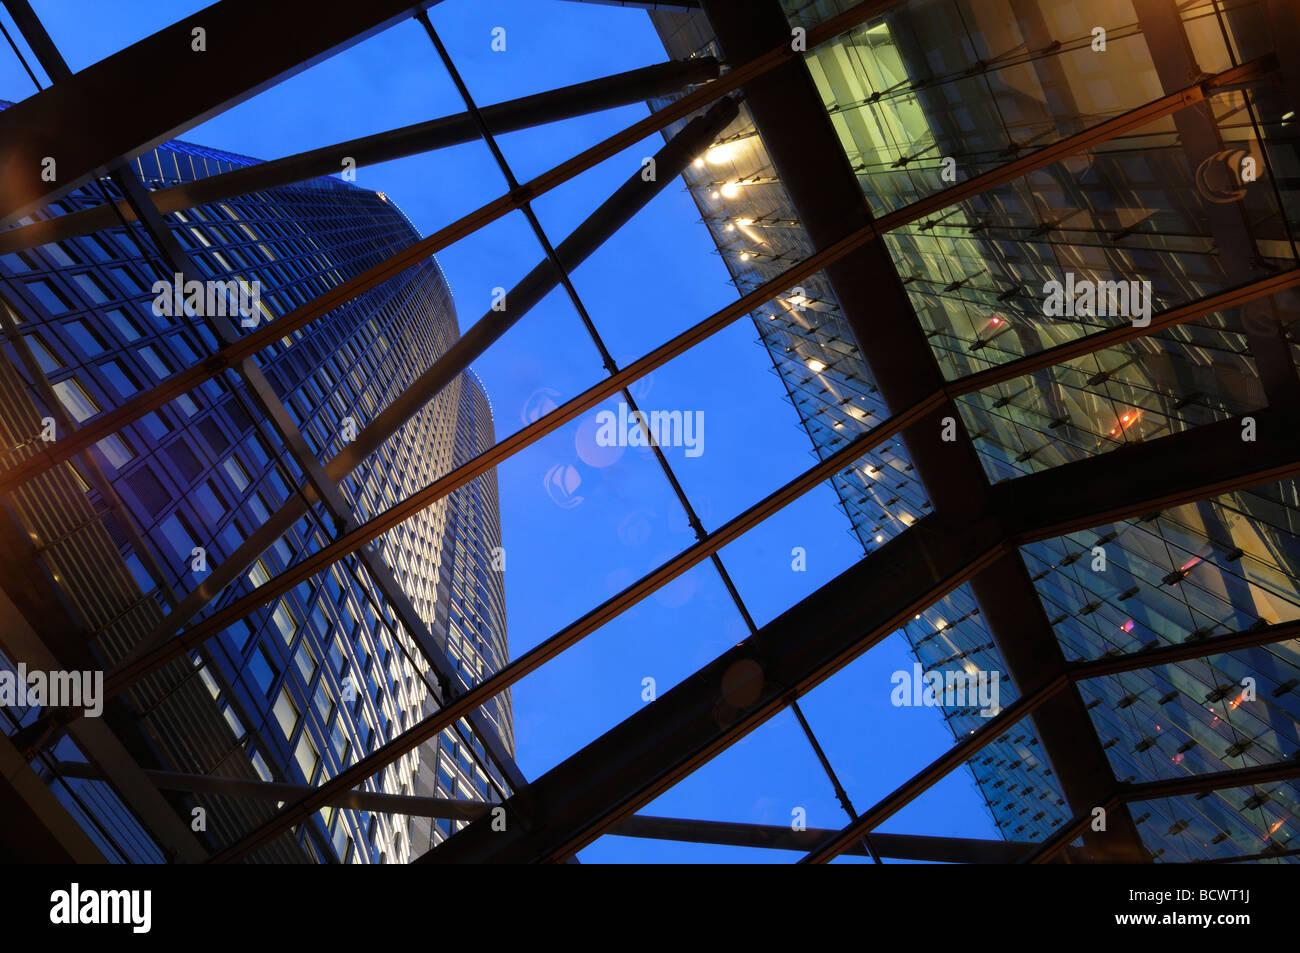 Modernen Gebäudekomplex in Roppongi Hills im Stadtteil Roppongi Tokyo Japan Stockbild